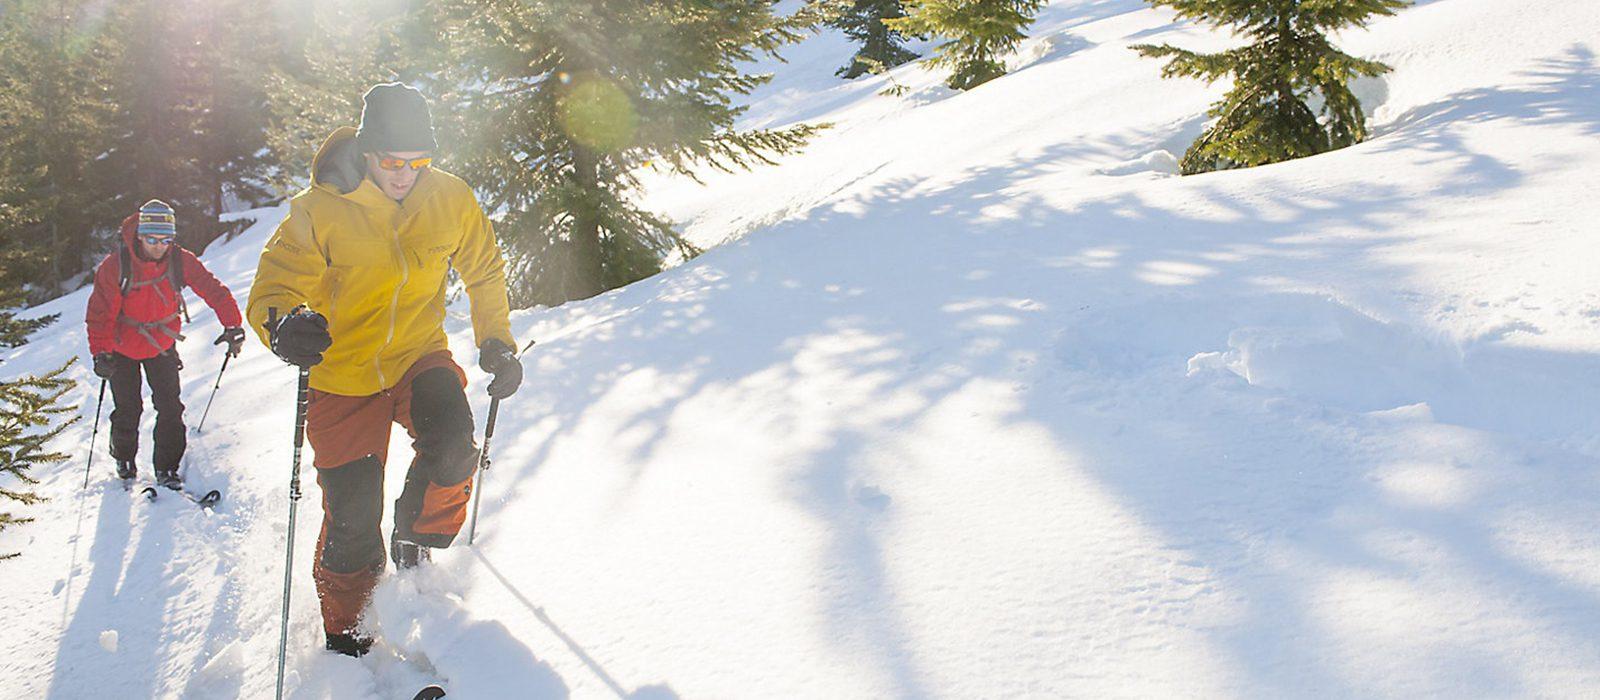 adrenaline-hiver-quebec-ski-nordique-quatre-nature-quebec-le-mag